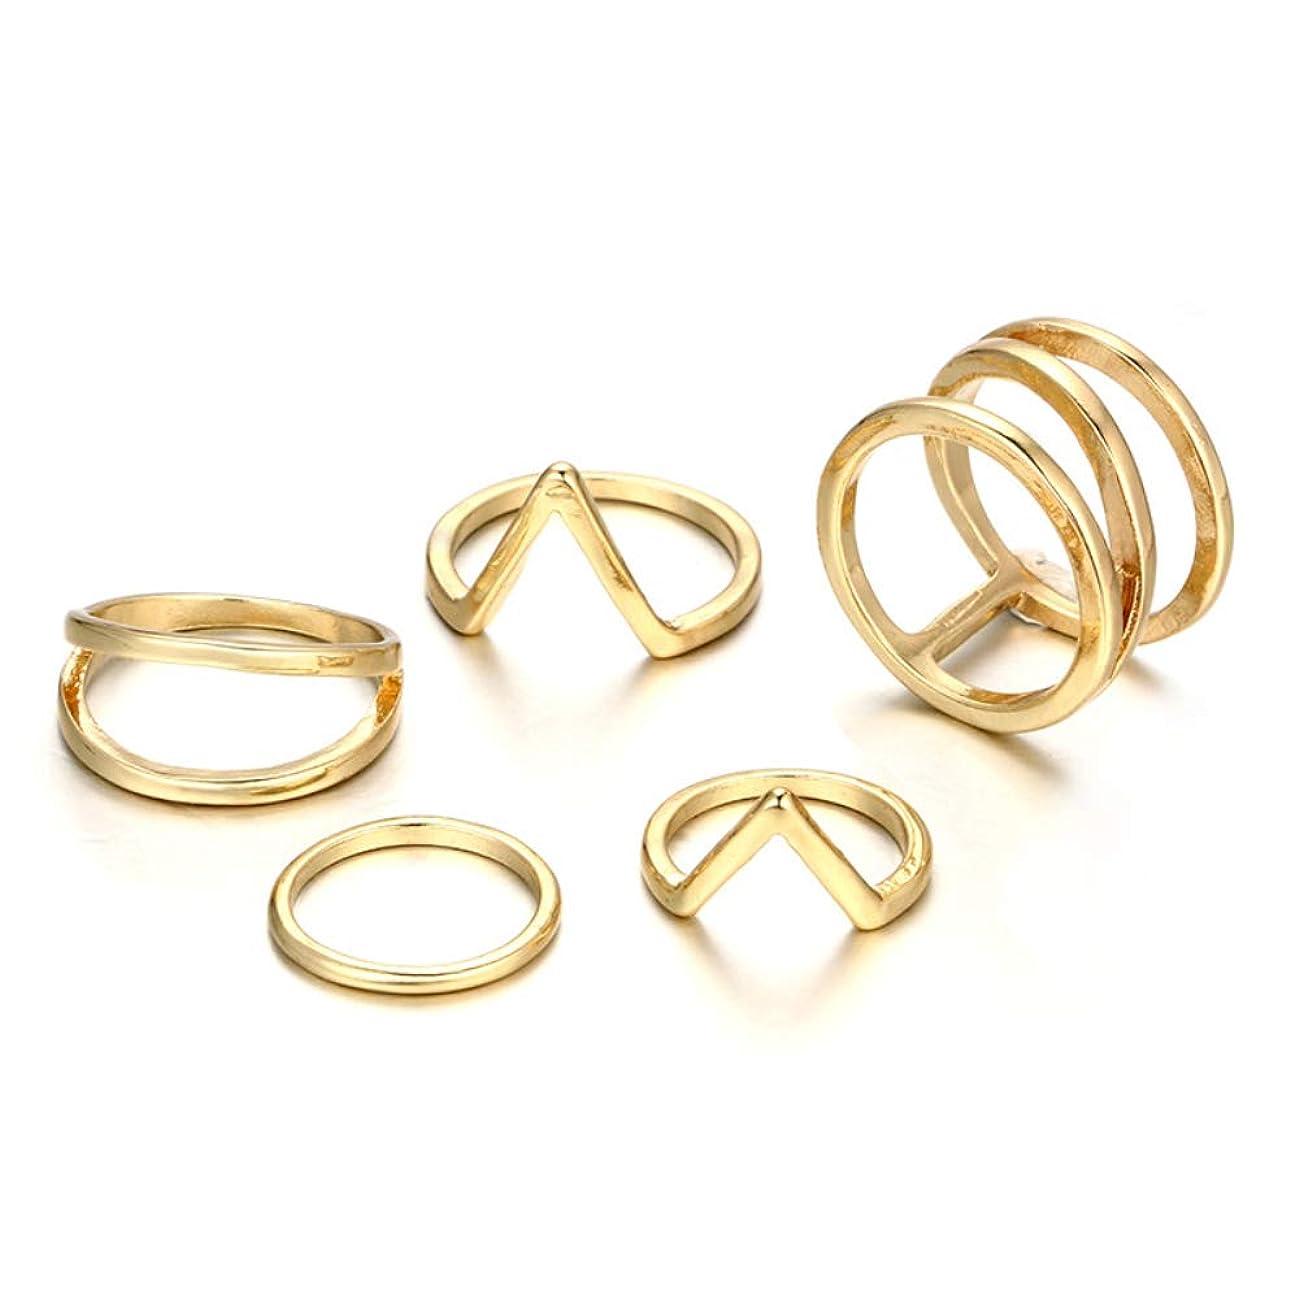 POYDORA Vintage Gold Bohemian Stack Rings V Rhinestone Joint Rings Knuckle Nail Ring Set for Women Girls (5 PCS)